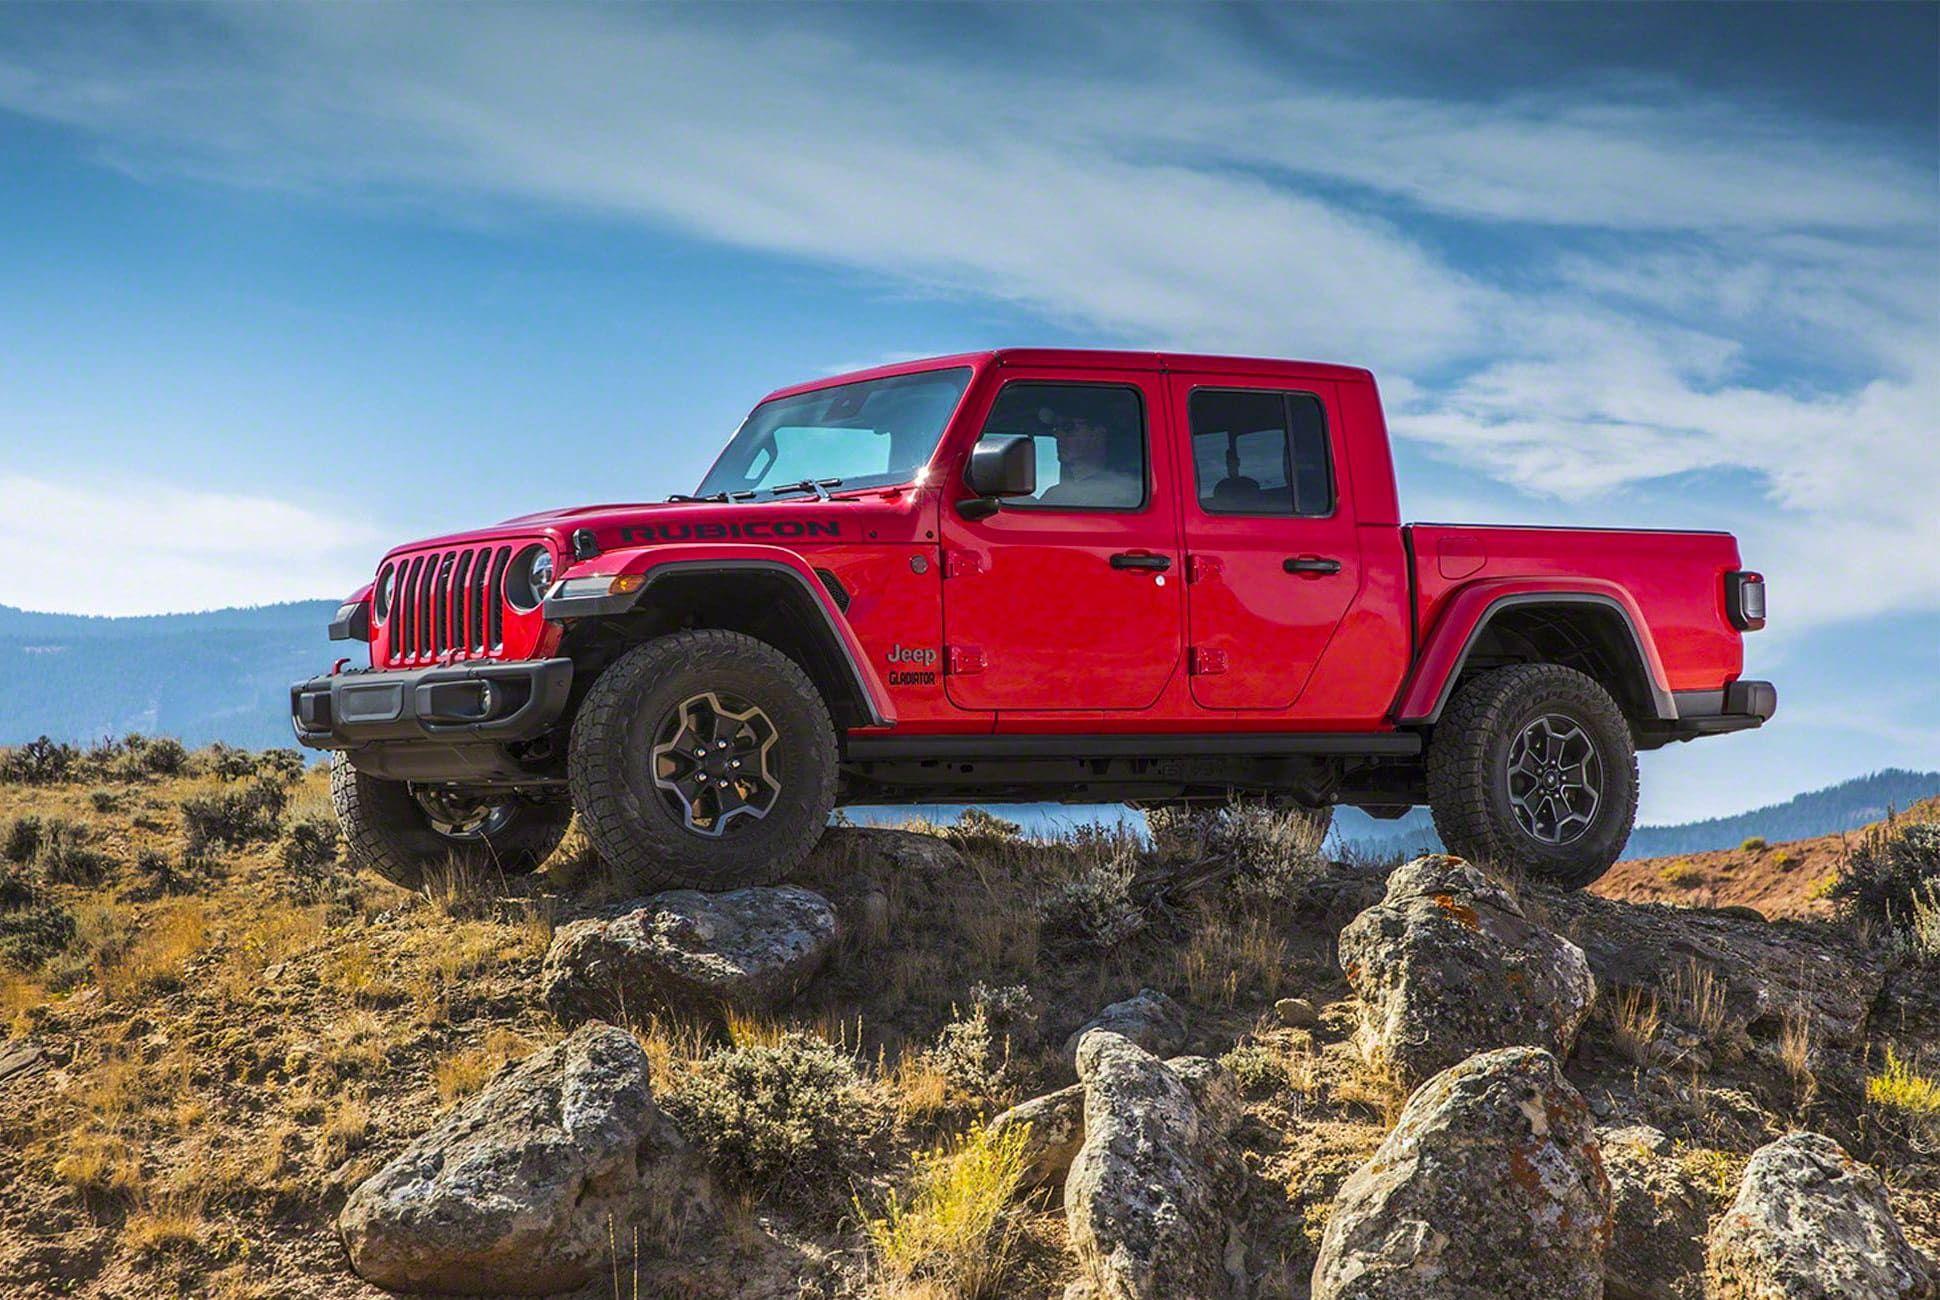 2019-Jeep-Gladiator-gear-patrol-slide-1